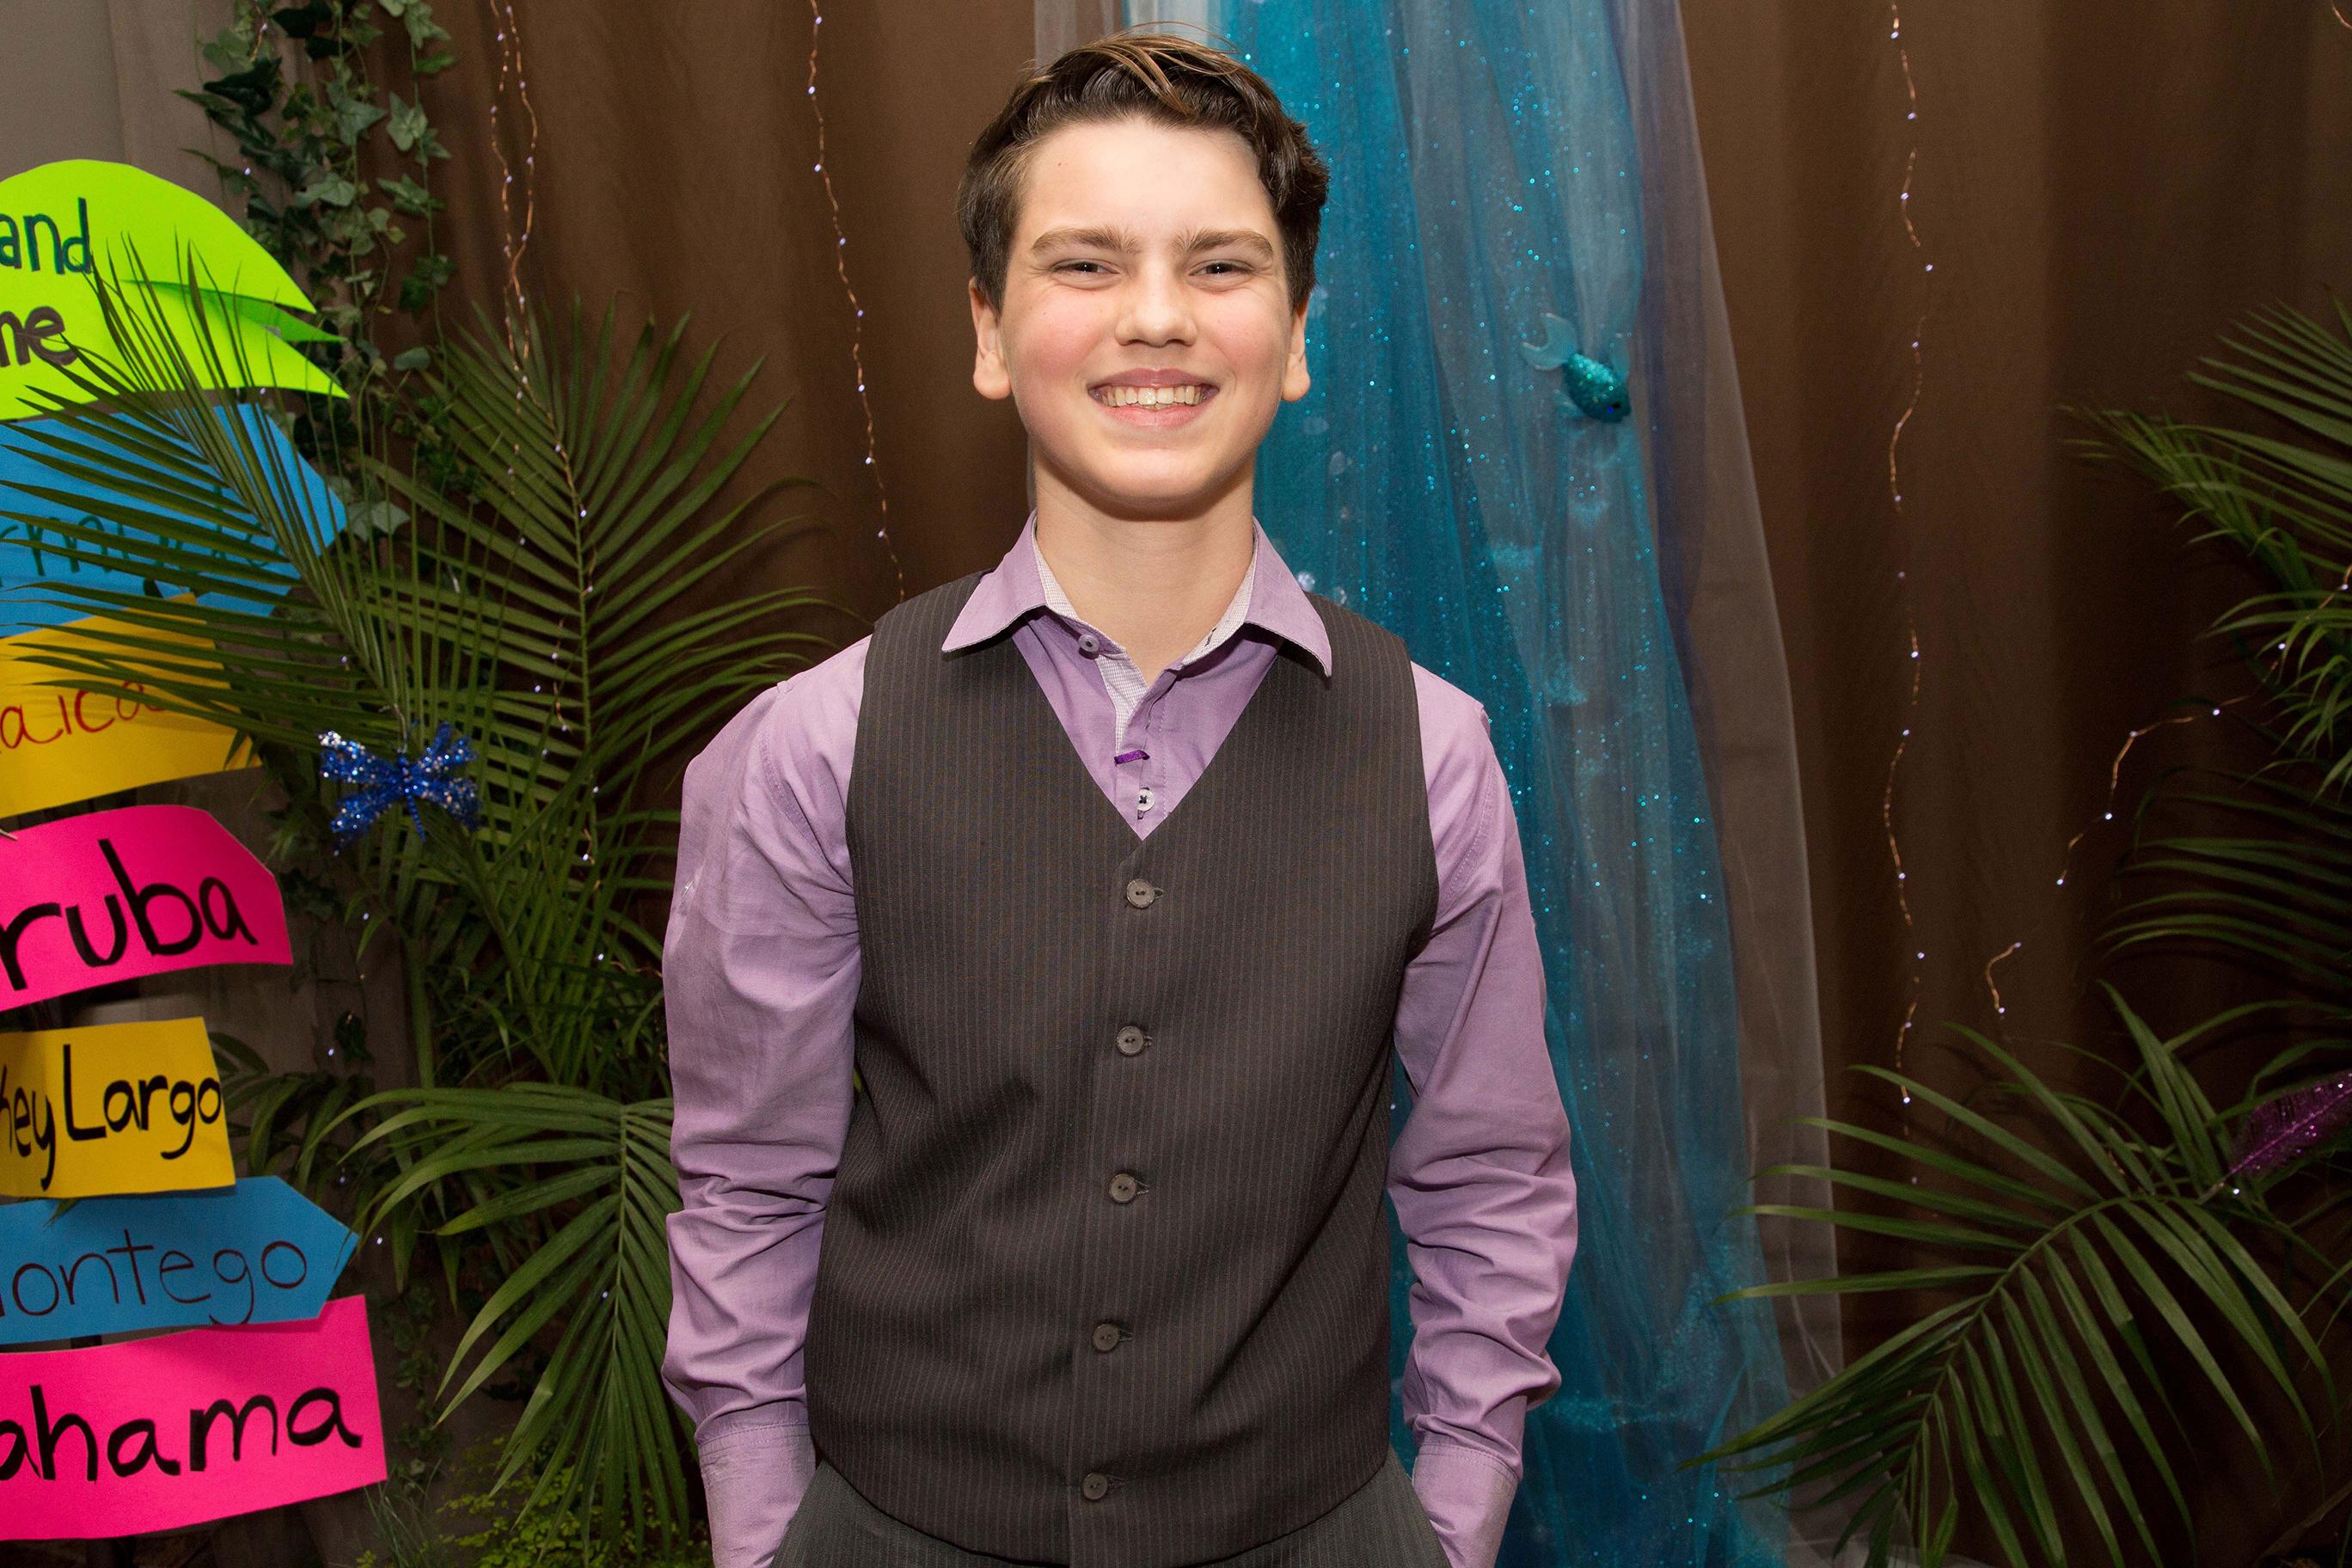 Alejandro Alleman - renal teen prom